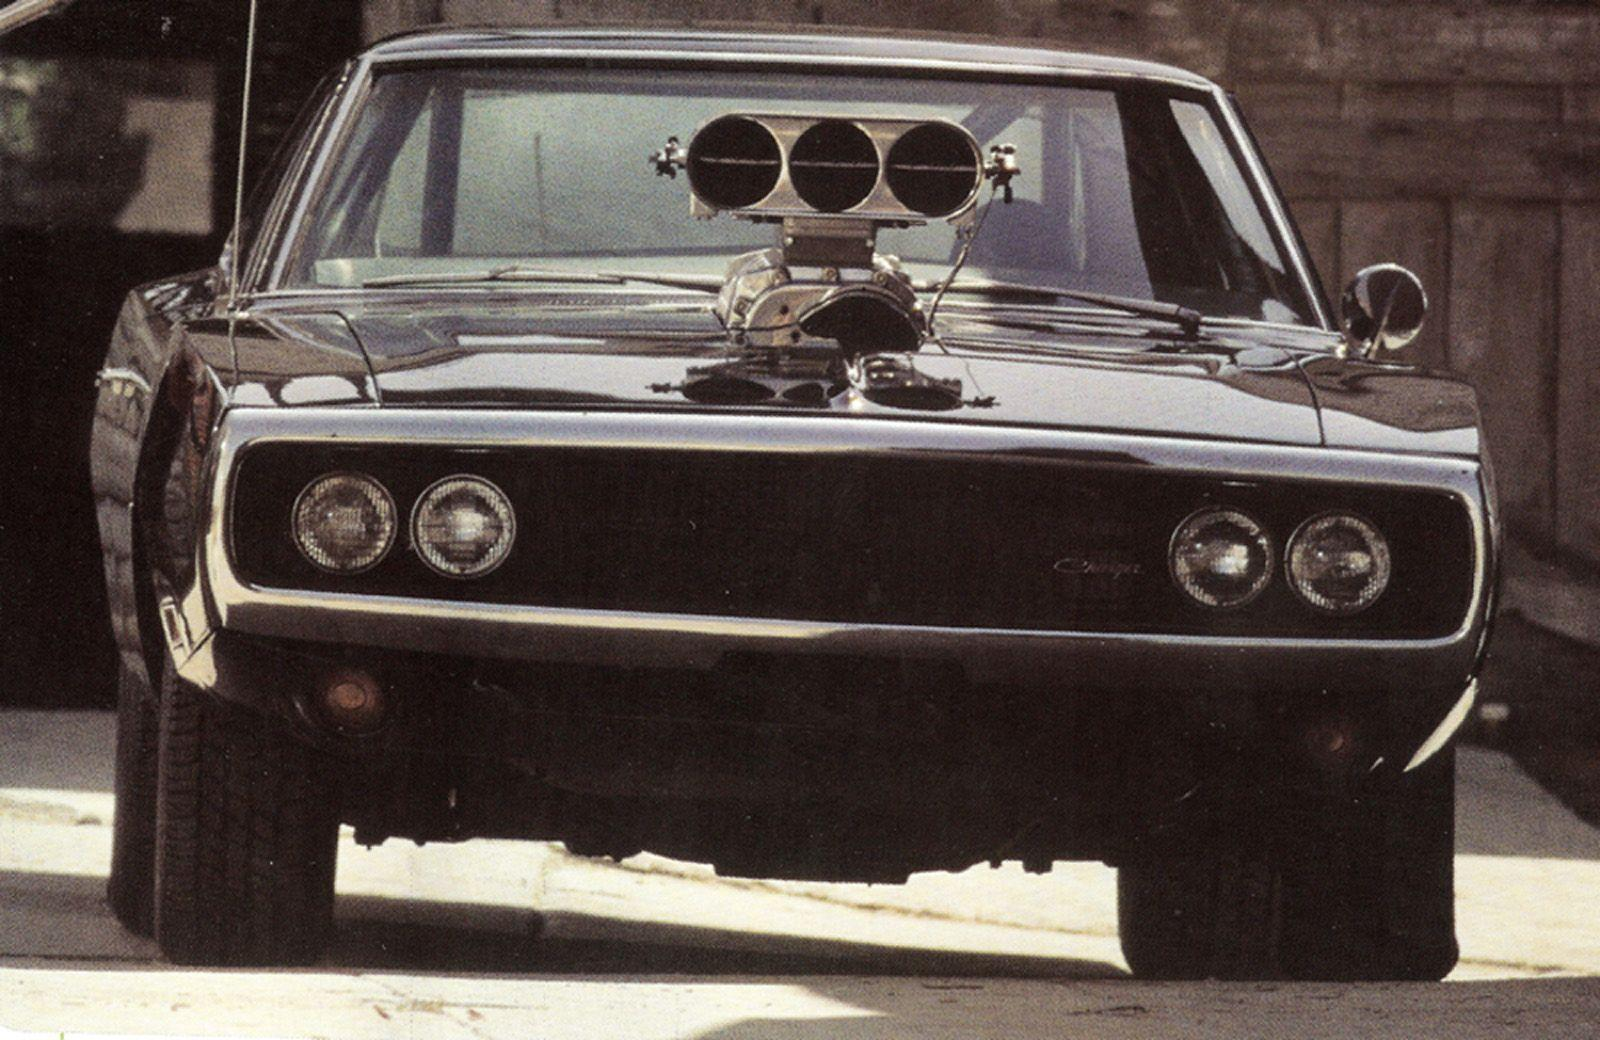 1970 Dodge Charger Wallpapers - Wallpaper Cave on 1970 dodge durango, dodge polara rt, dodge dart rt, 1970 dodge caliber, 1970 dodge super bee rt, dodge challenger rt, 1970 holden charger rt, 1970 dodge challenger station wagon, 1970 dodge stratus, dodge coronet rt, 1970 plymouth road runner rt, 1970 dodge ram 3500, 1970 dodge challenger 440 supercharged, dodge ram rt, 1970 dodge go mango, 1970 dodge dart car, 1970 dodge challenger se, dodge magnum rt, 1970 dodge challenger from inside, dodge avenger rt,